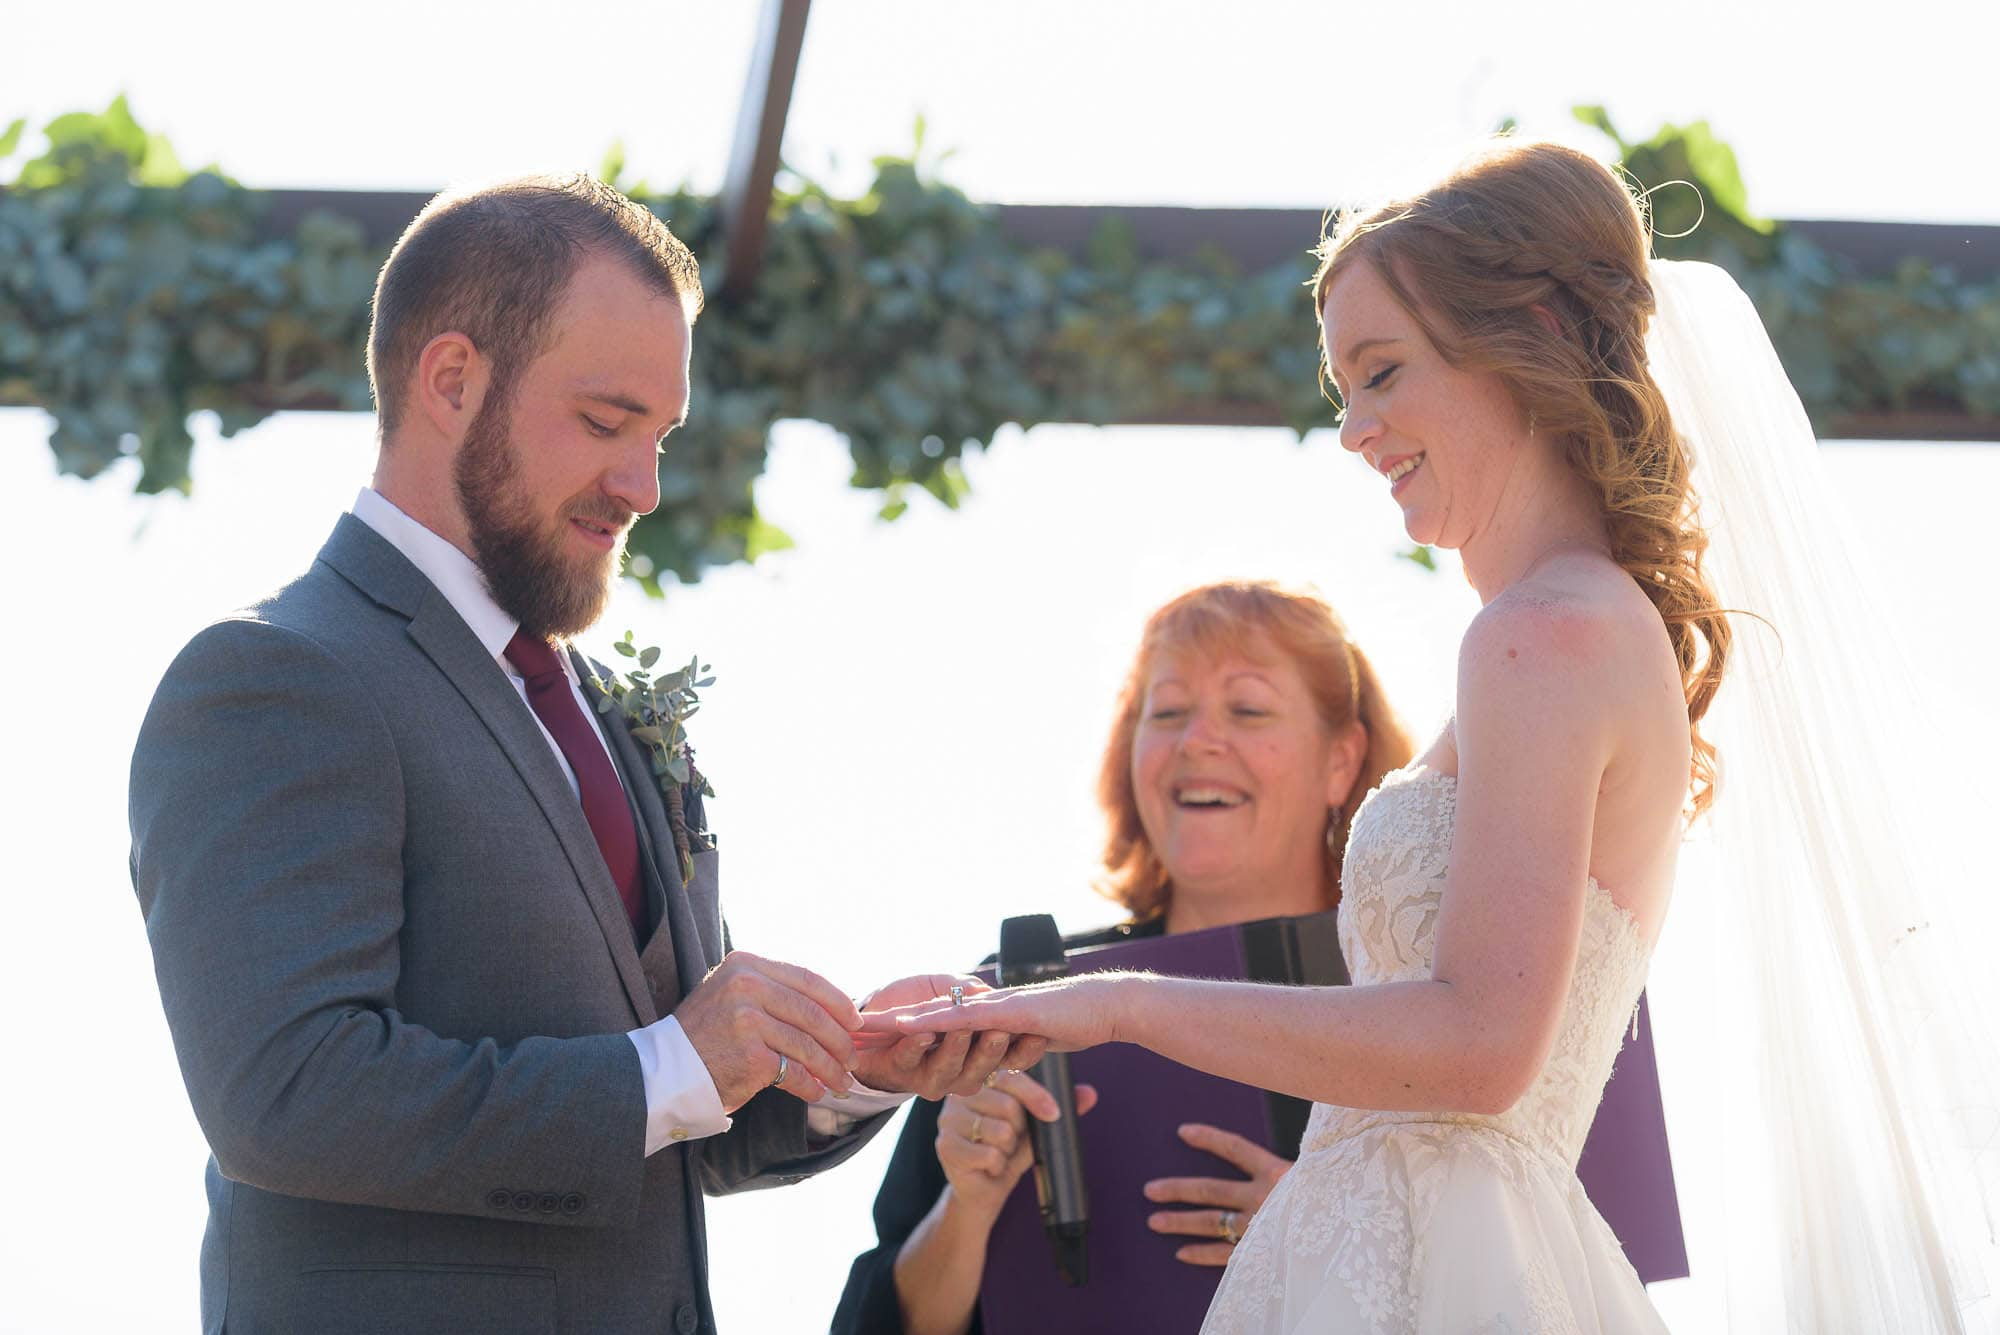 276_Alan_and_Heidi_Serendipity_Garden_Wedding_10-27-2018